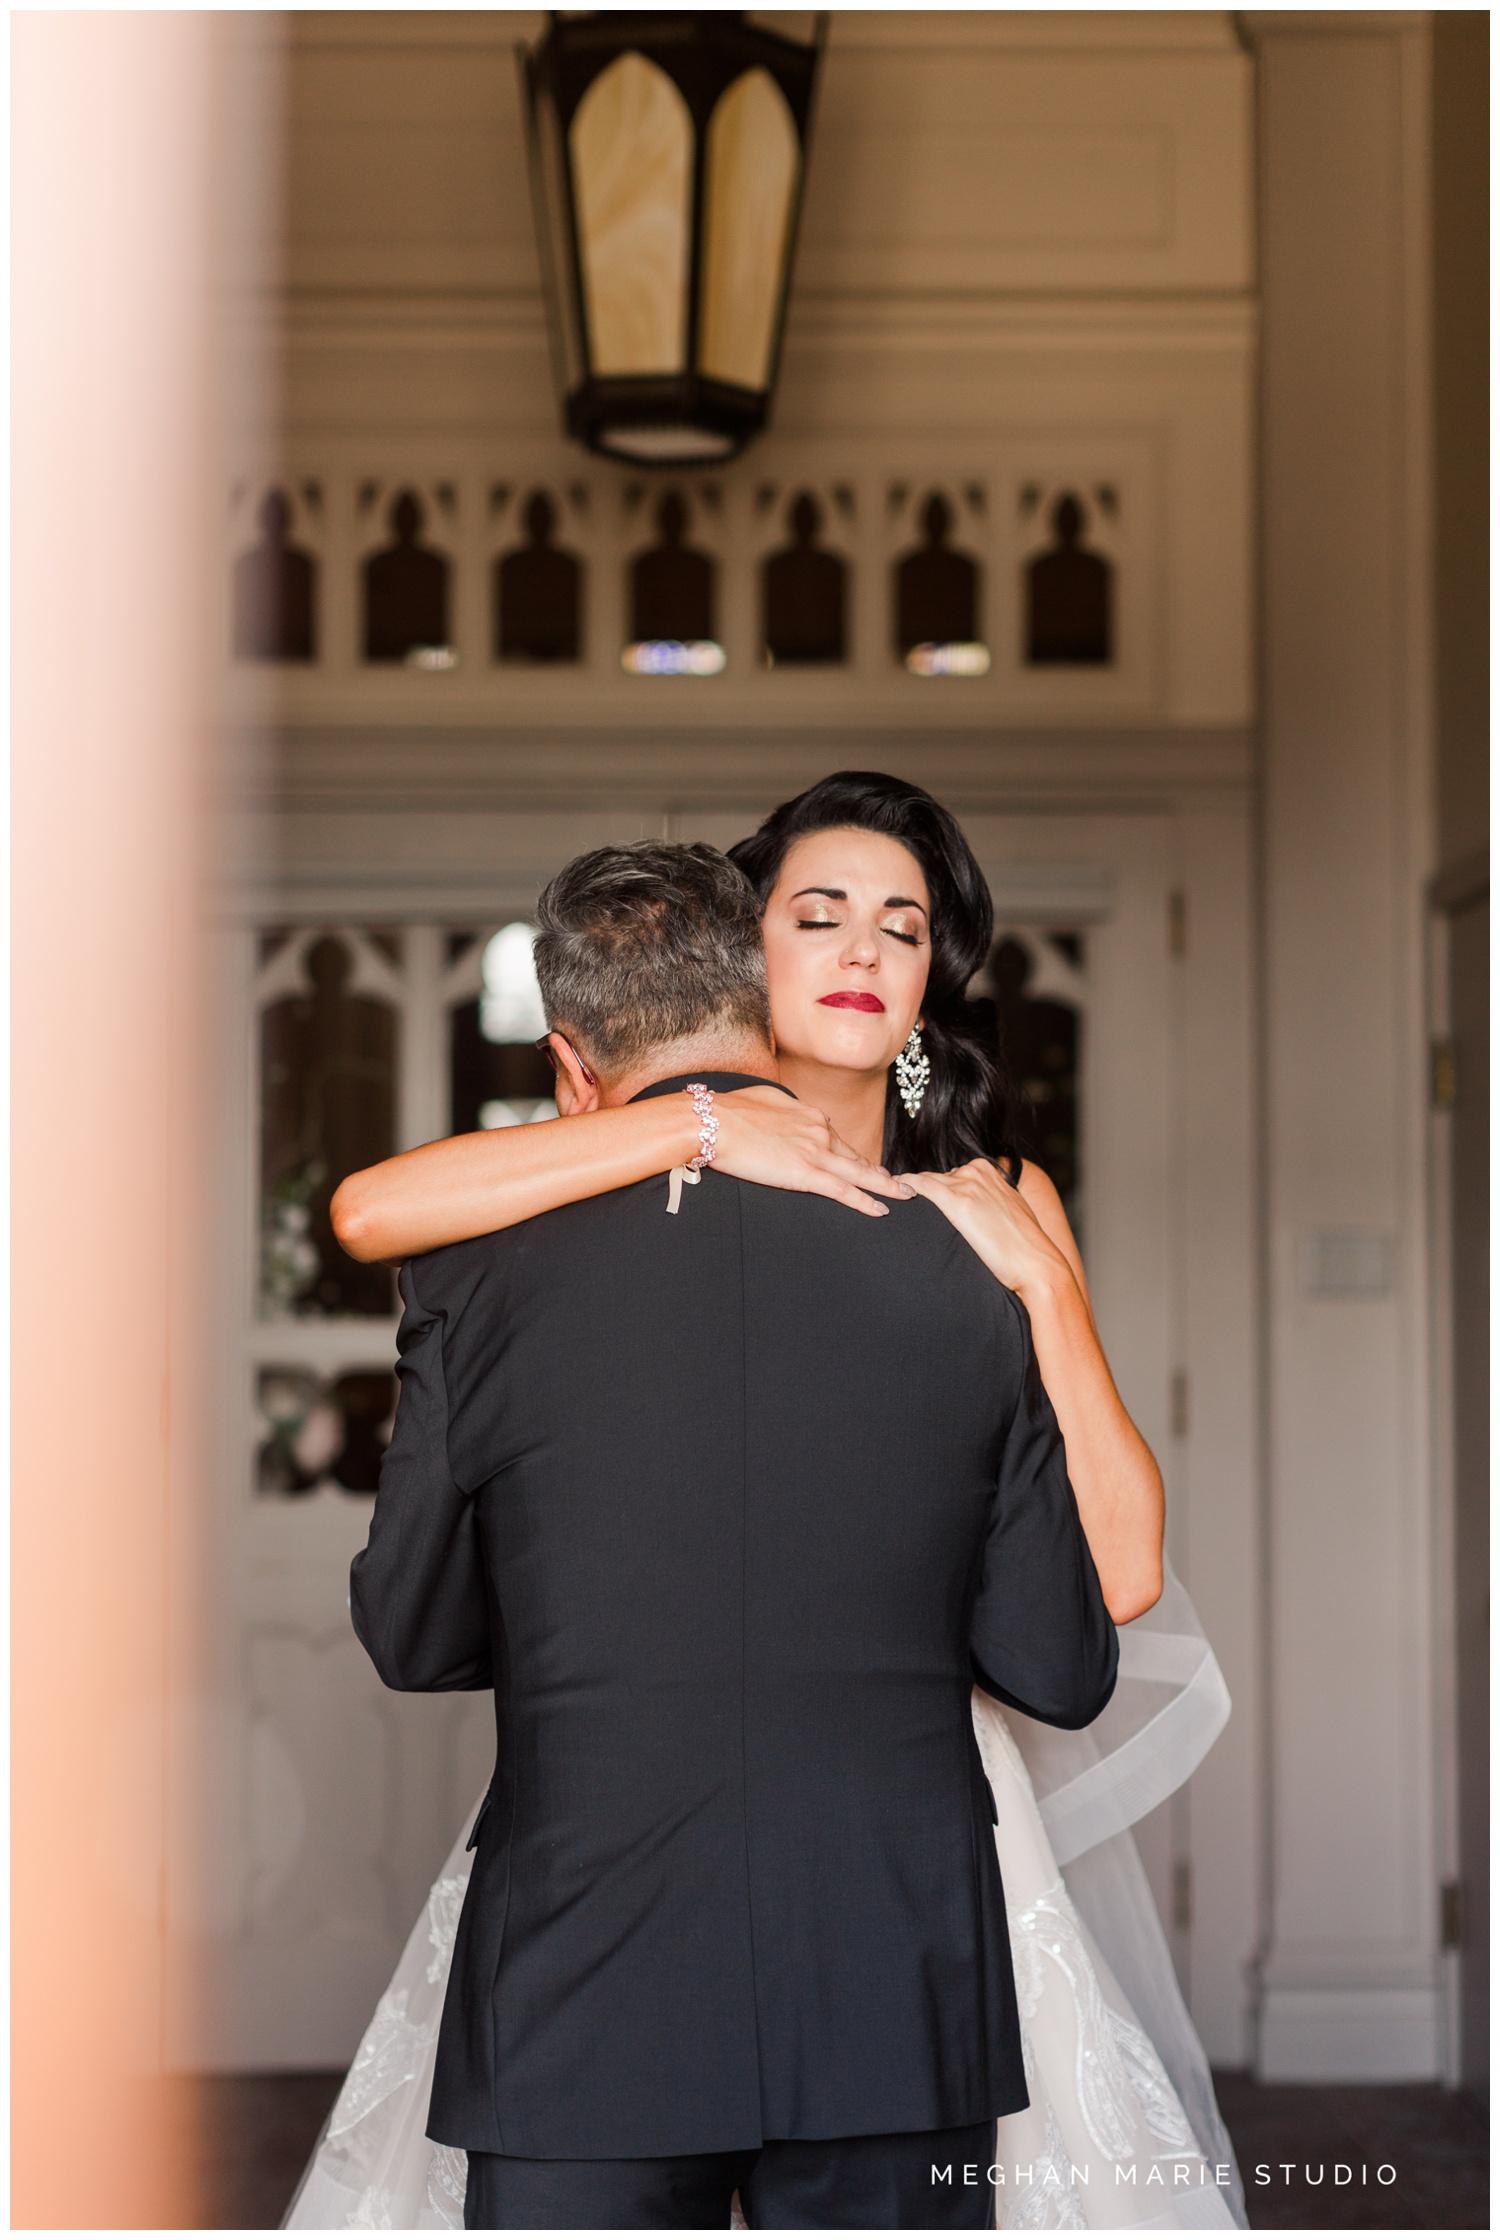 meghan marie studio wedding photographer ohio troy dayton columbus fort loramie st michael hall demange ken midmark elegant black suits metallics hollywood soft glam family wedding_0495.jpg